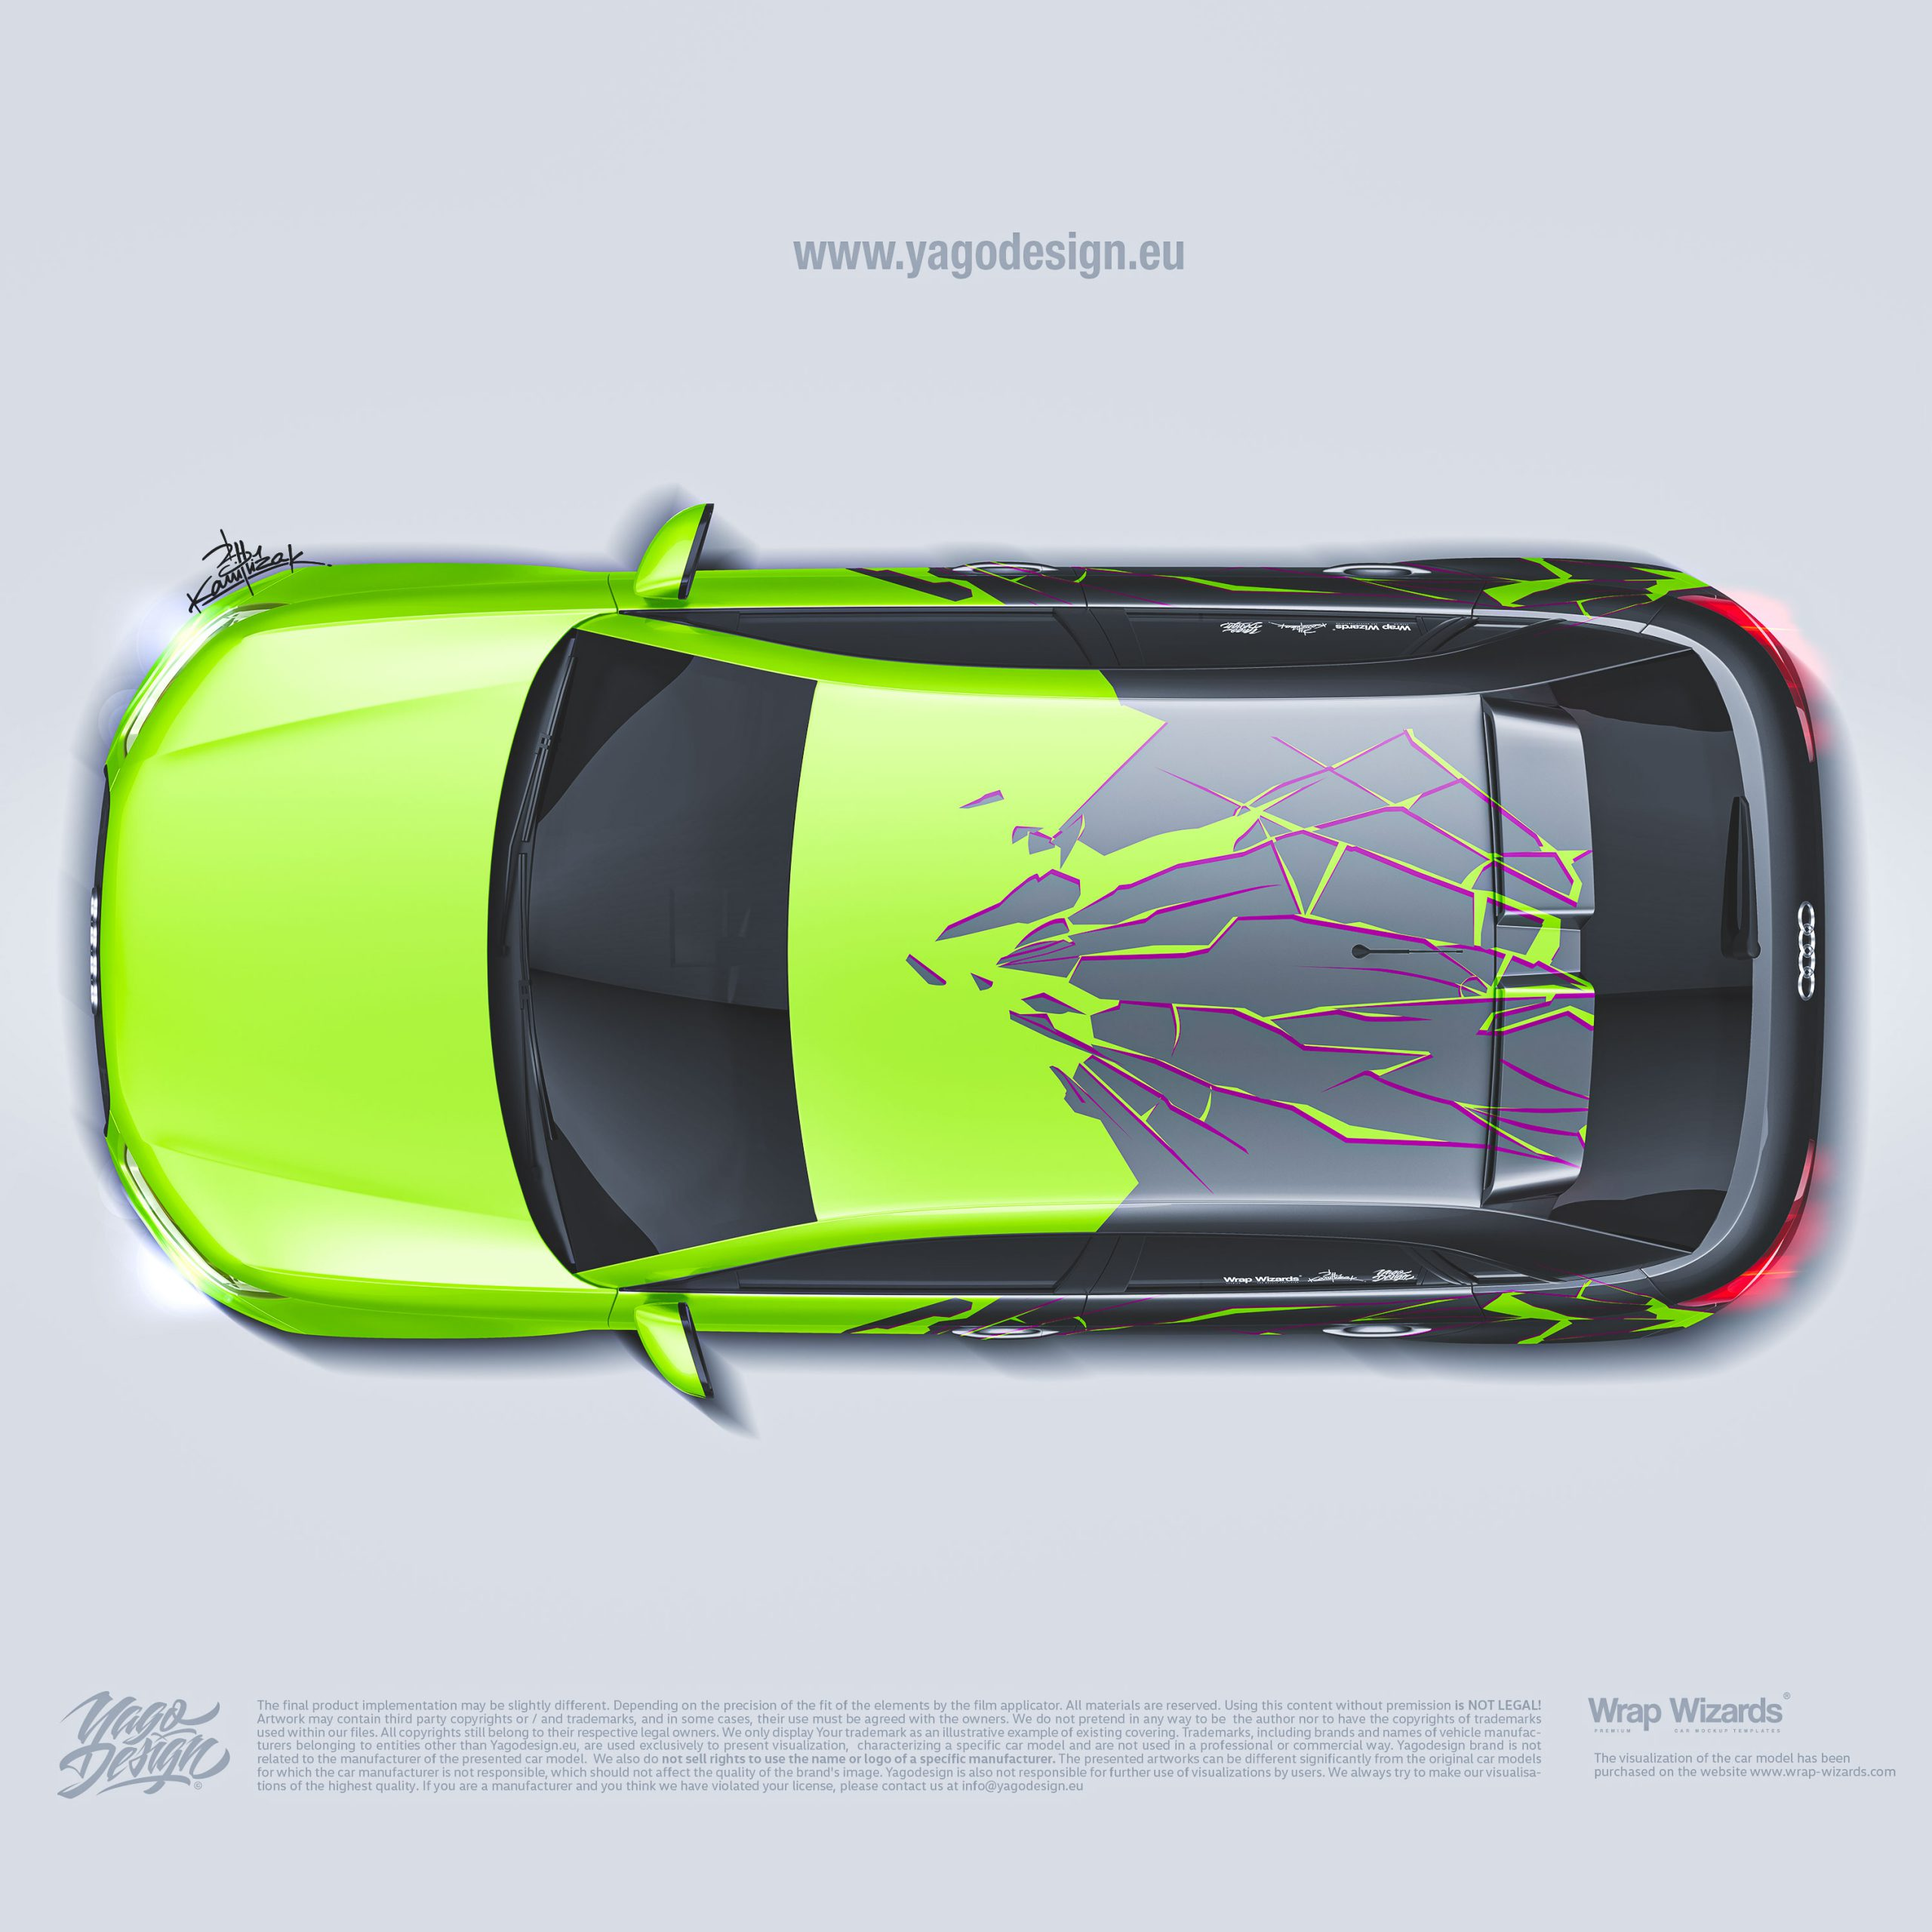 Audi-A1-Sportback-by-Yagodesign-Automotive-Design-Studio-scaled